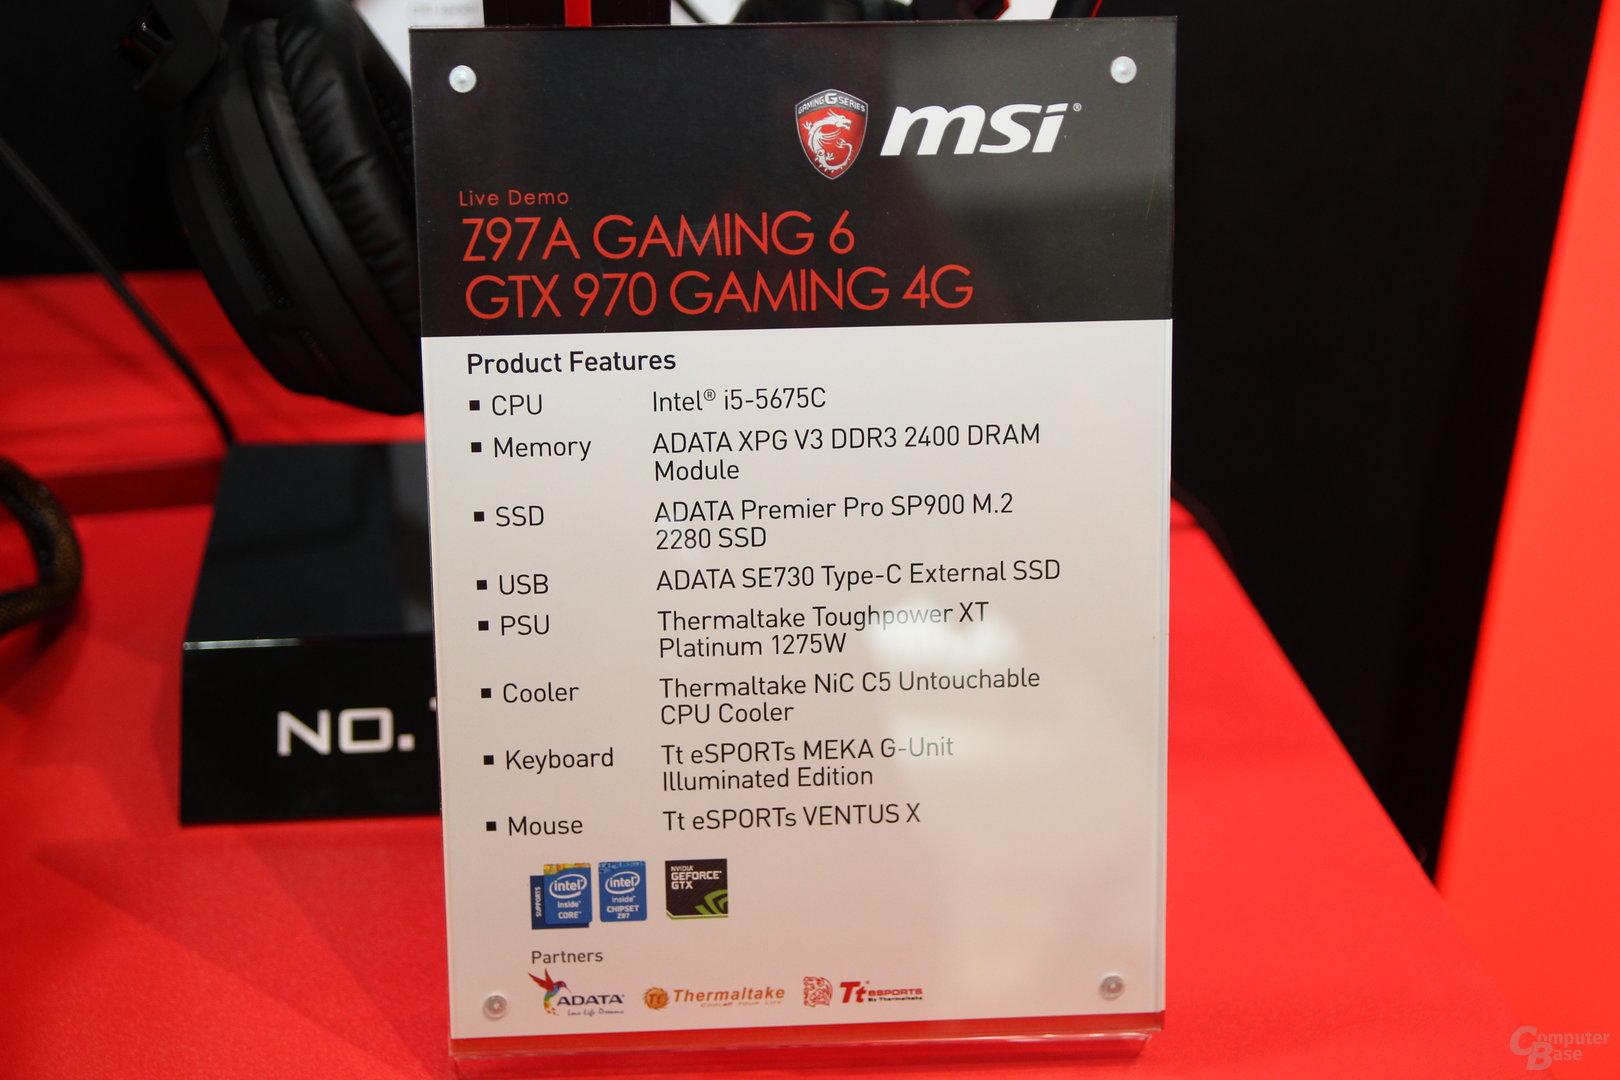 MSI-Desktop-System mit Quad-Core-Broadwell-CPU Core i5-5675C